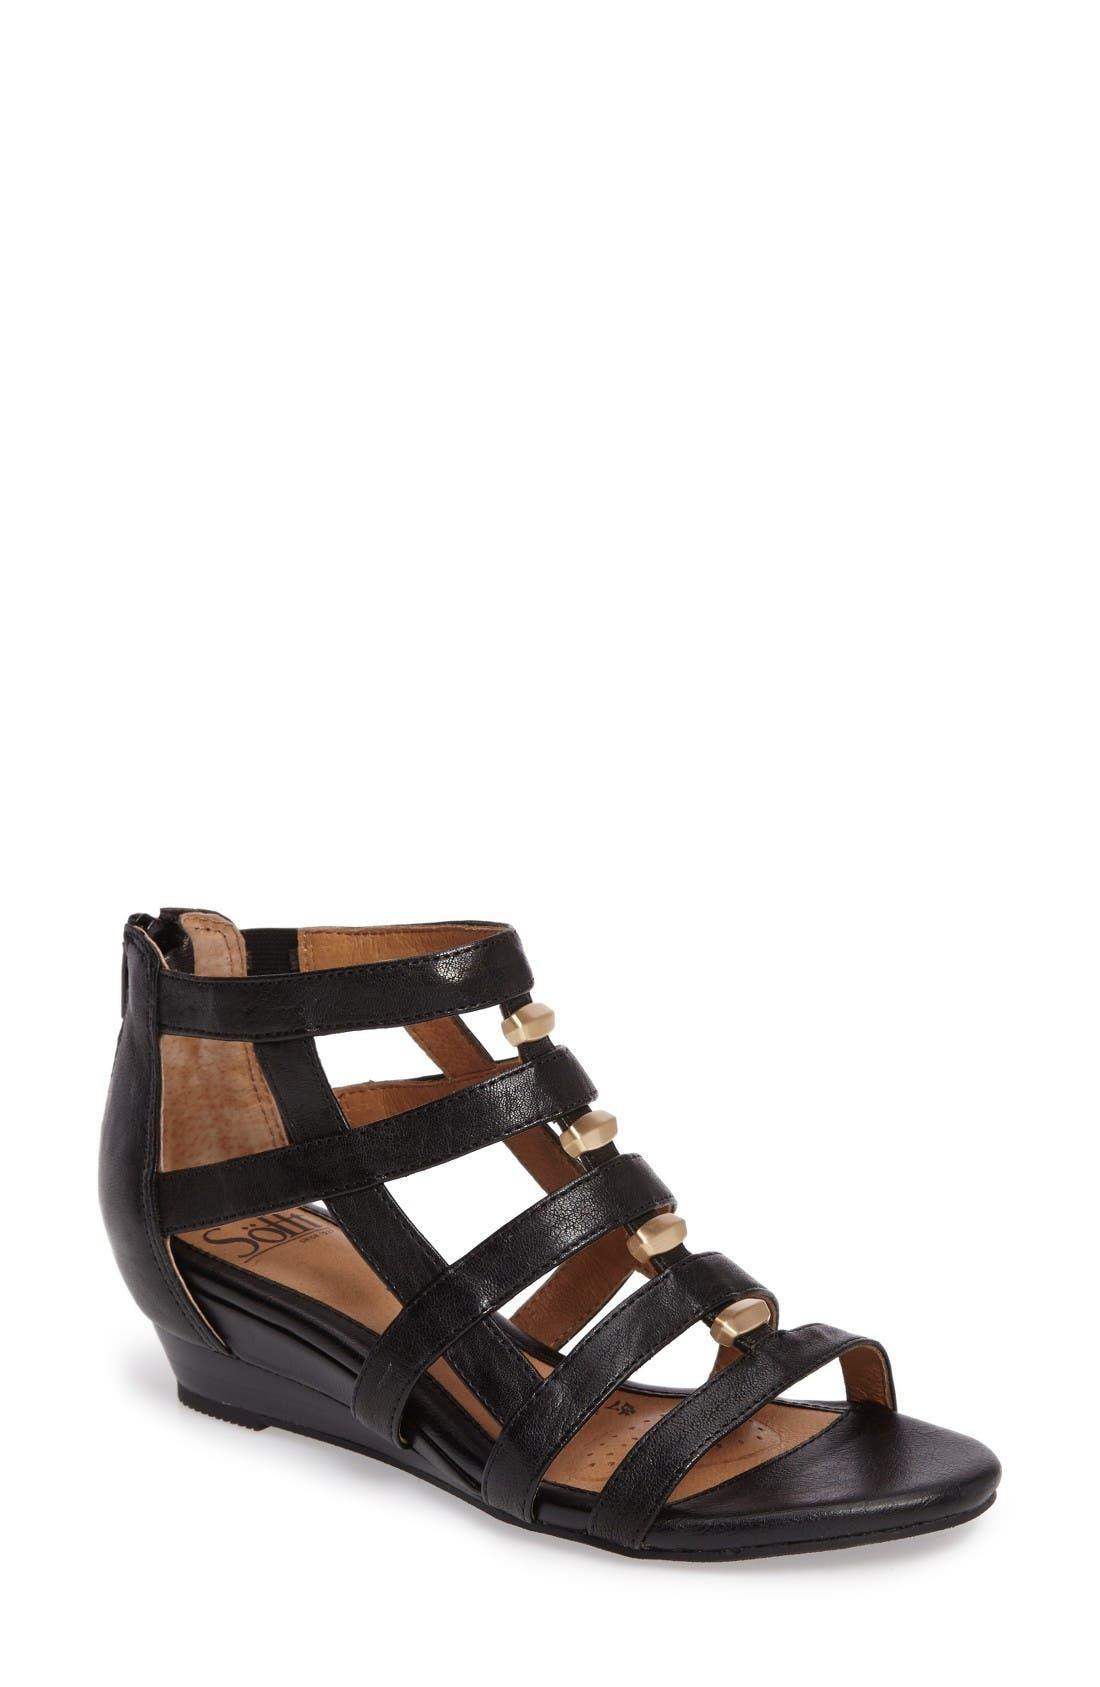 Rio Gladiator Wedge Sandal,                         Main,                         color, Black Leather